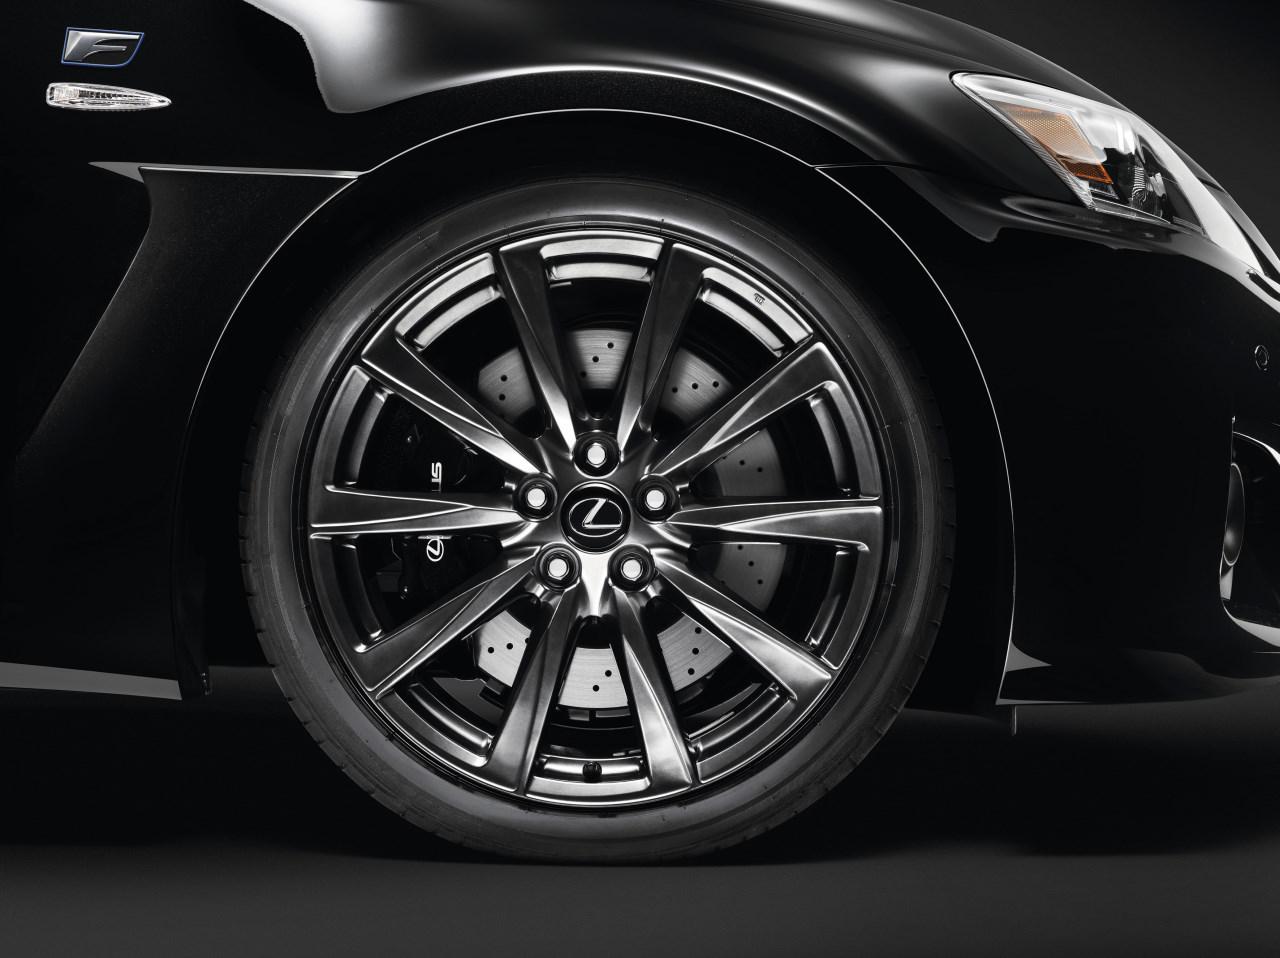 Foto de Lexus IS-F 2011 (12/13)